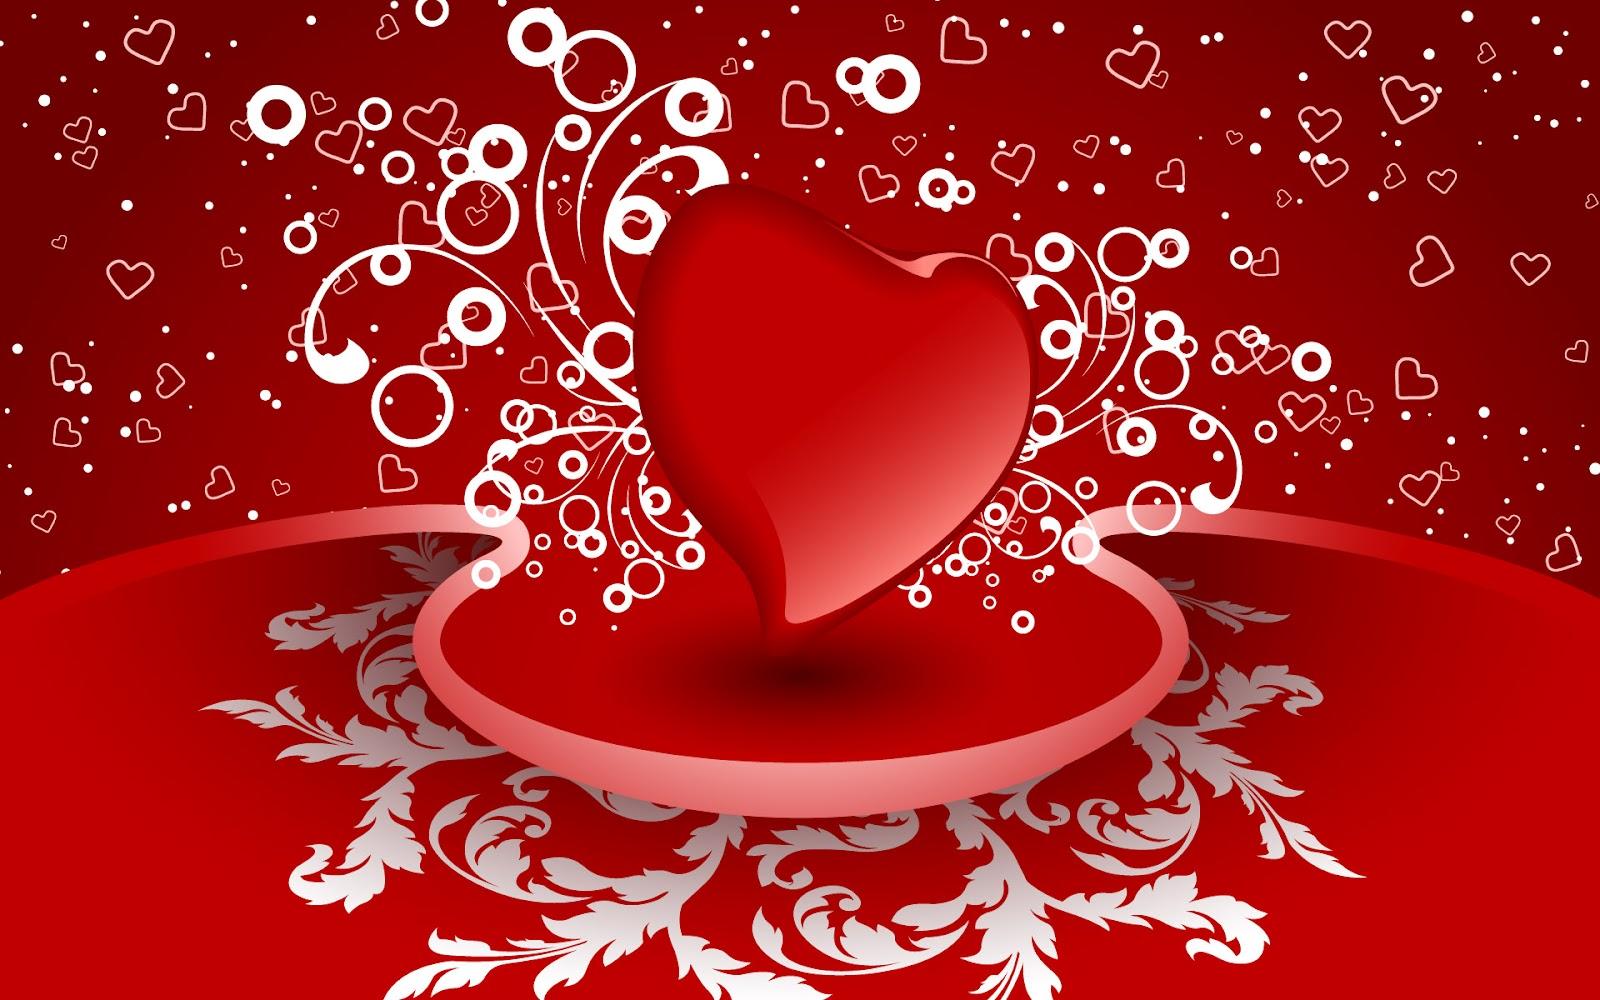 http://3.bp.blogspot.com/-RH87U-7rMrA/URoatJ2d4AI/AAAAAAAAATs/CRhCOUvj66k/s1600/Valentines-Day-Wallpapers-Pics-Images-2012.jpg